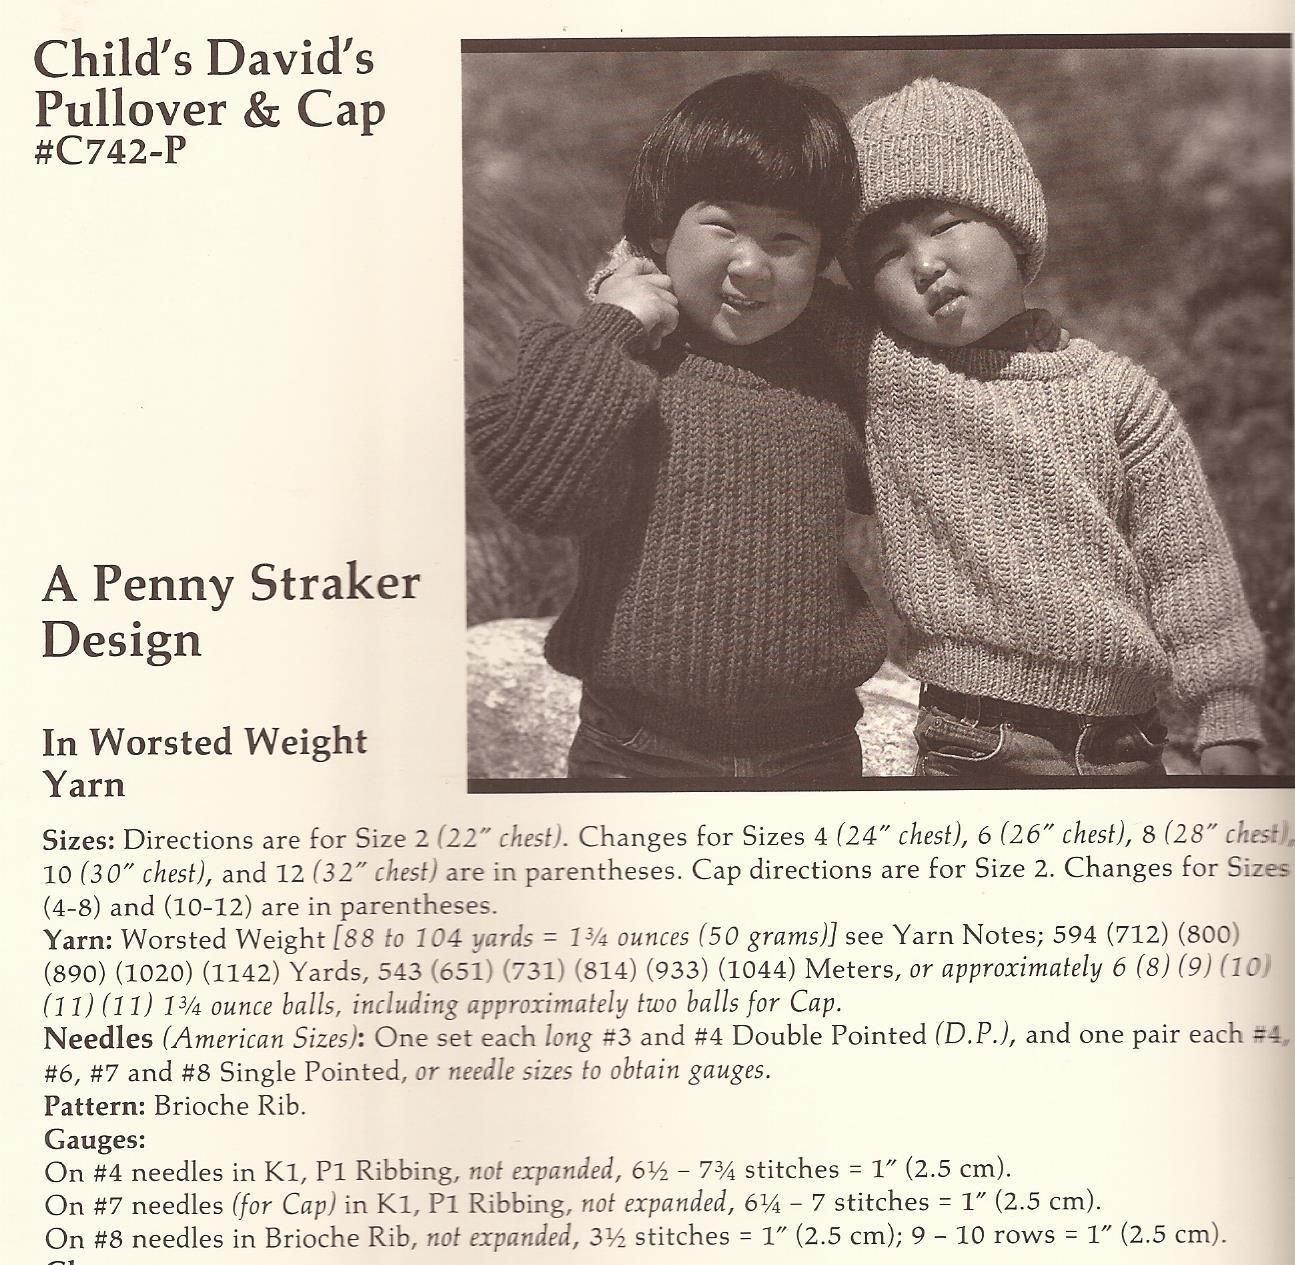 A Classic Straker Design Knitting Pattern #C742 Childs Davids Pullover /& Cap